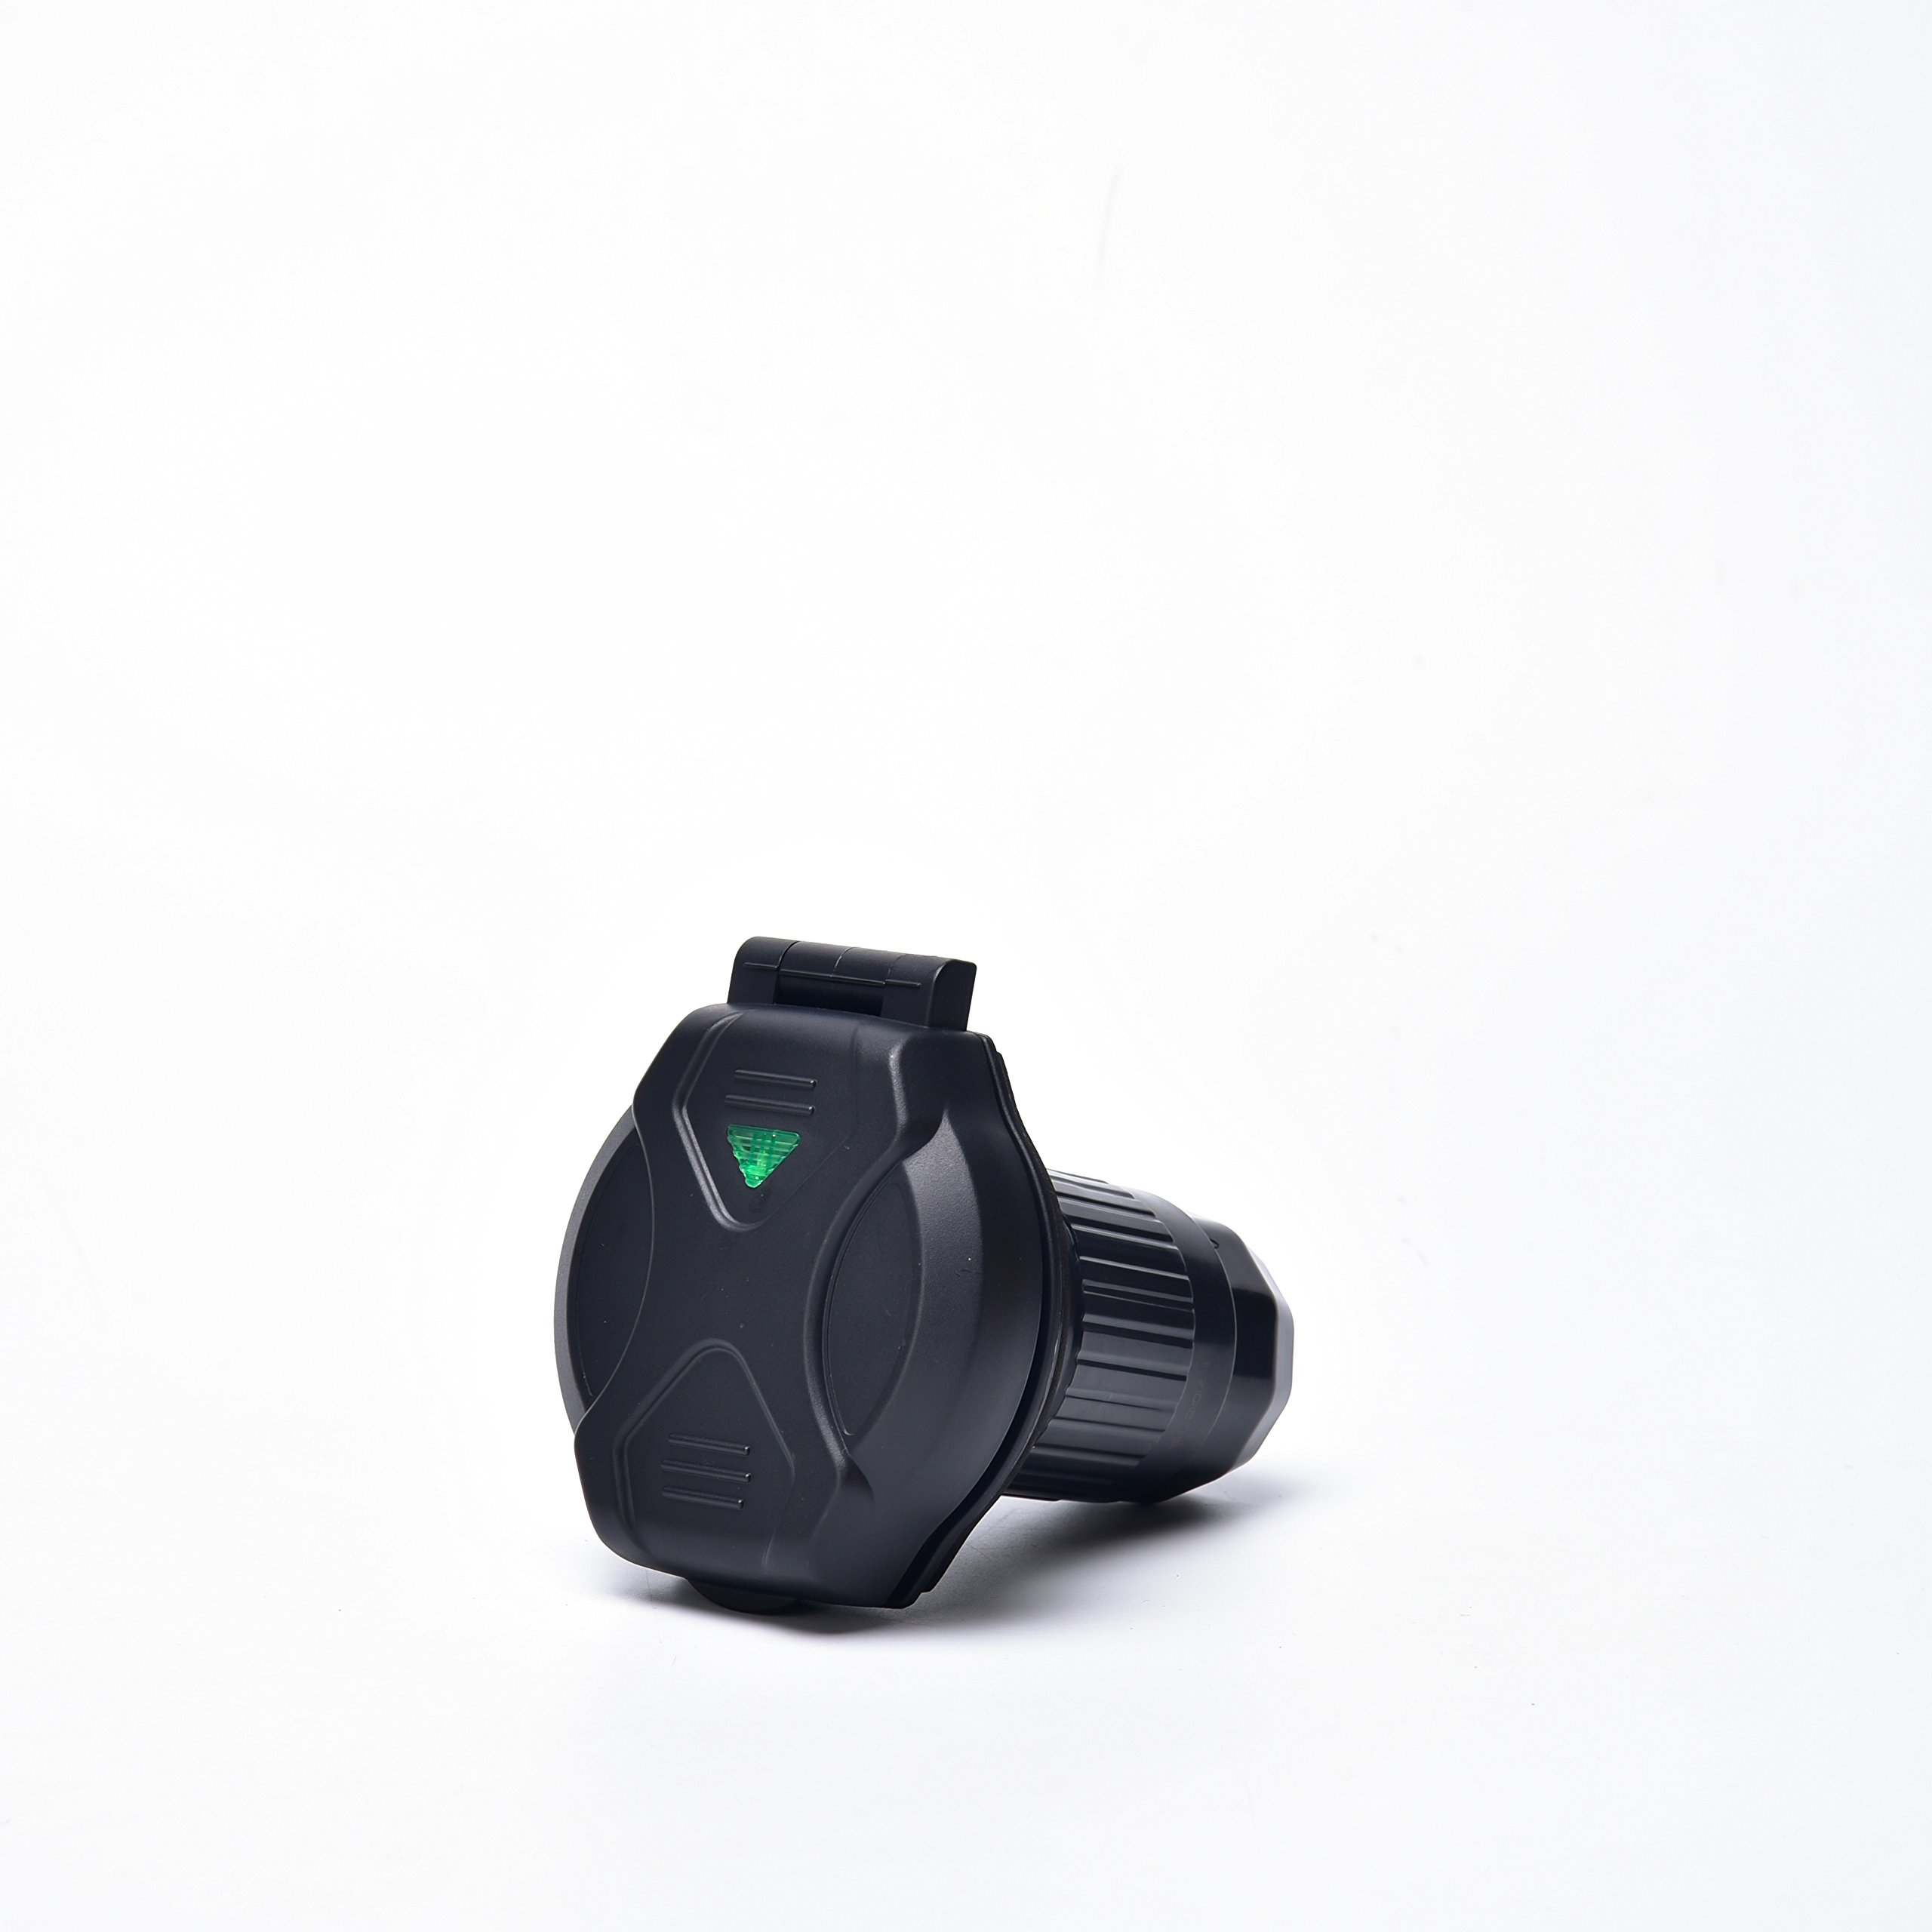 Epicord 50A RV Power Twist Lock Inlet (Blackwith Light)